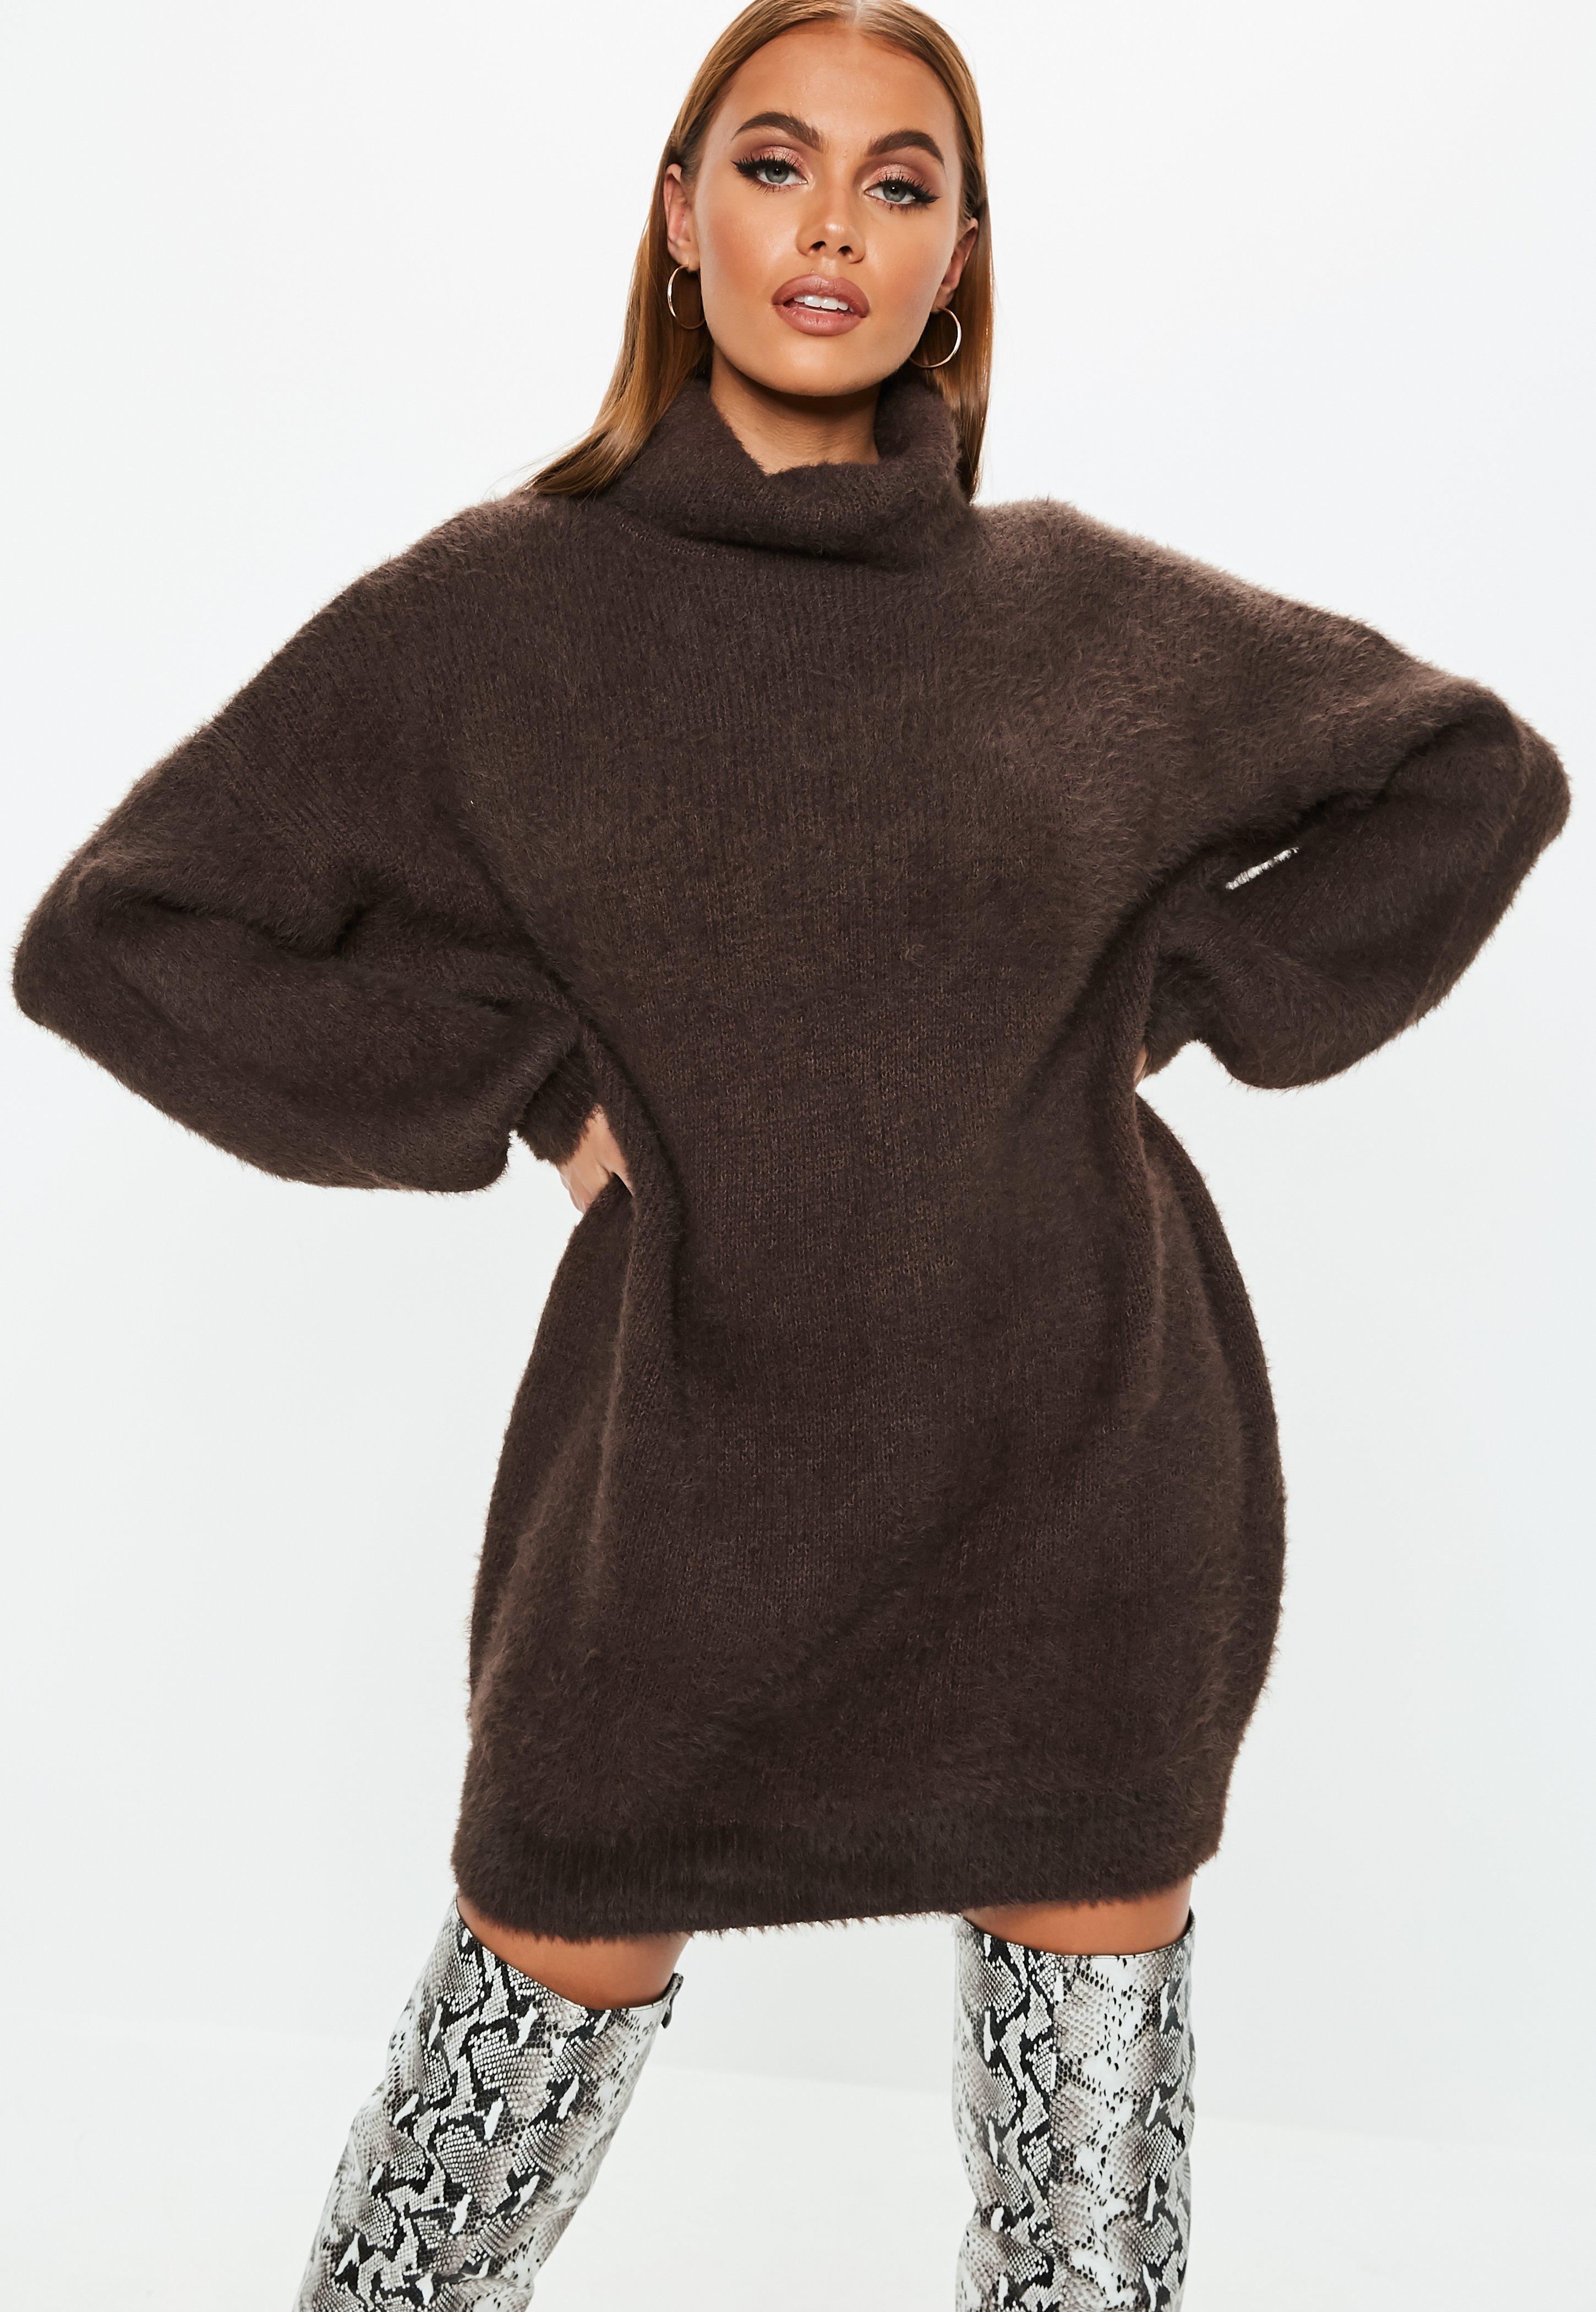 573ebc75d0c Robe pull